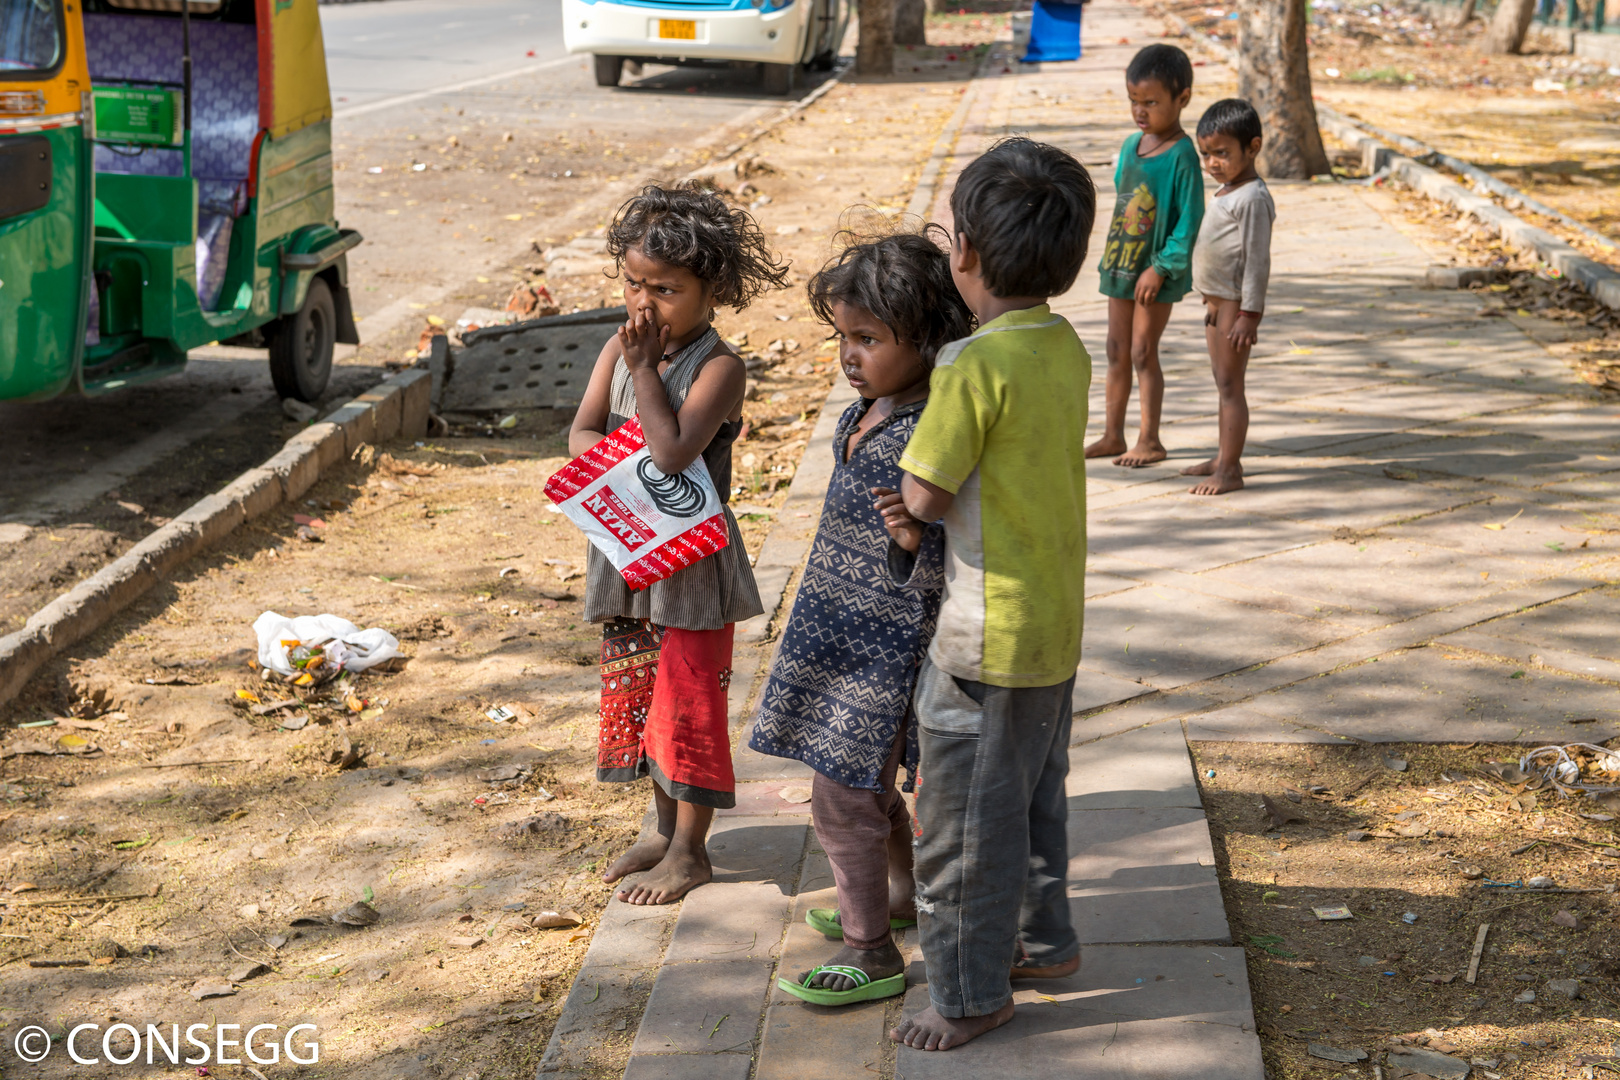 Kinder in Old Delhi